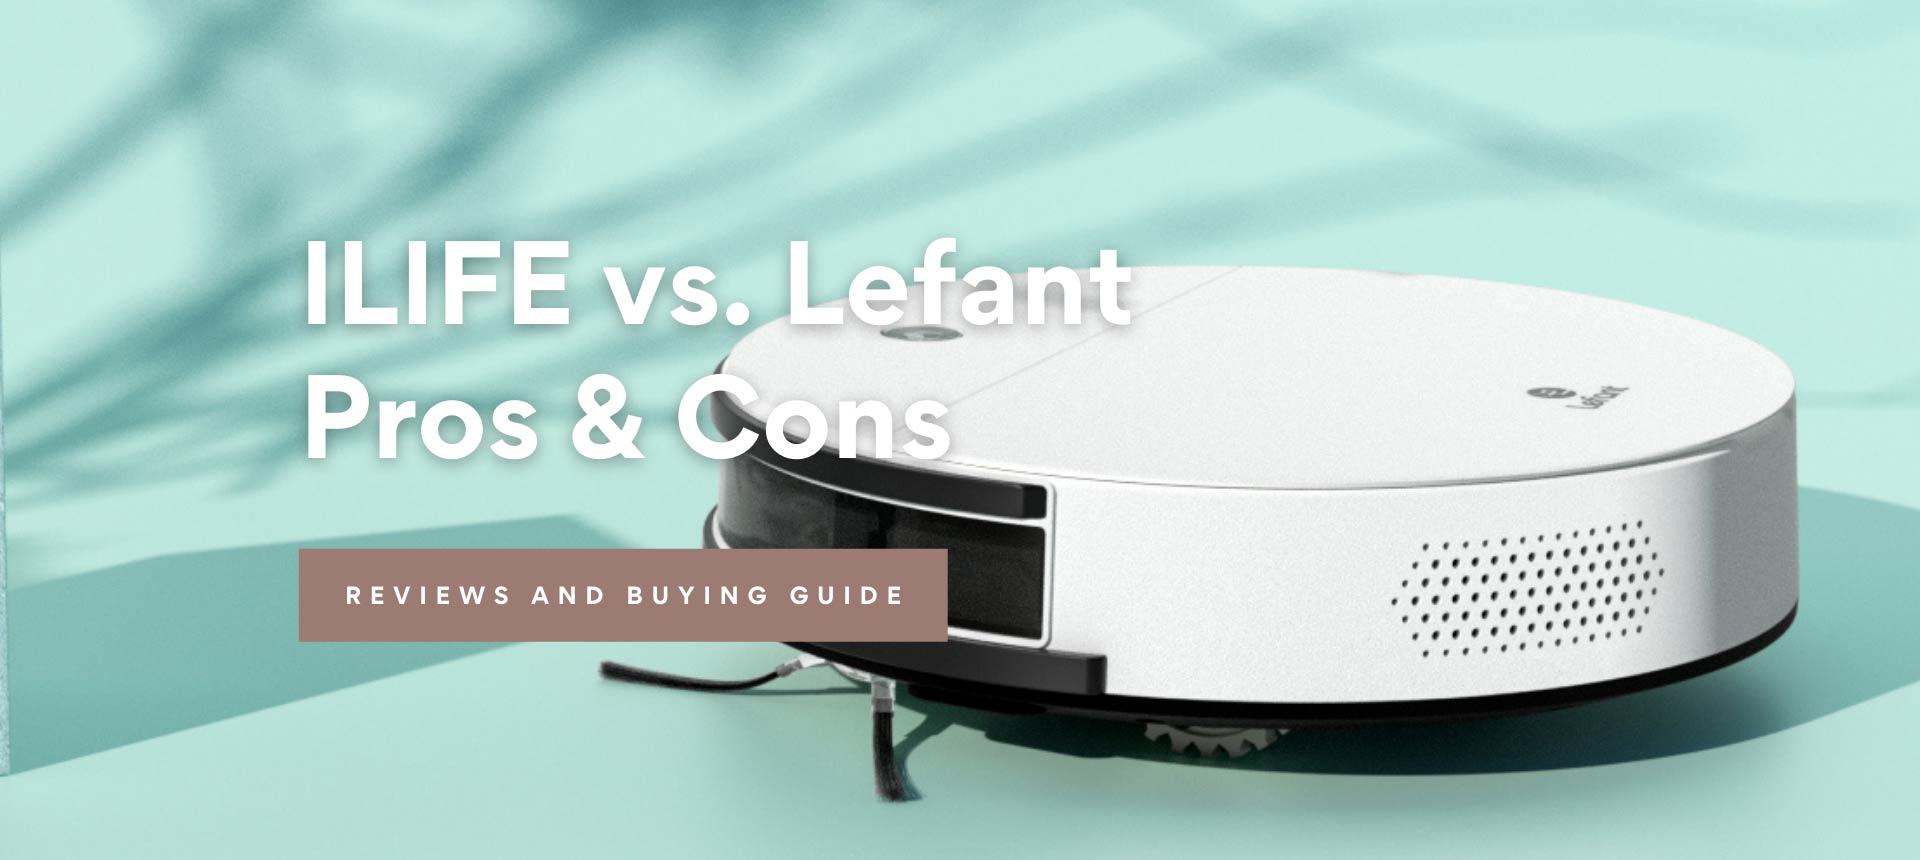 ILIFE vs. Lefant, Pros & Cons